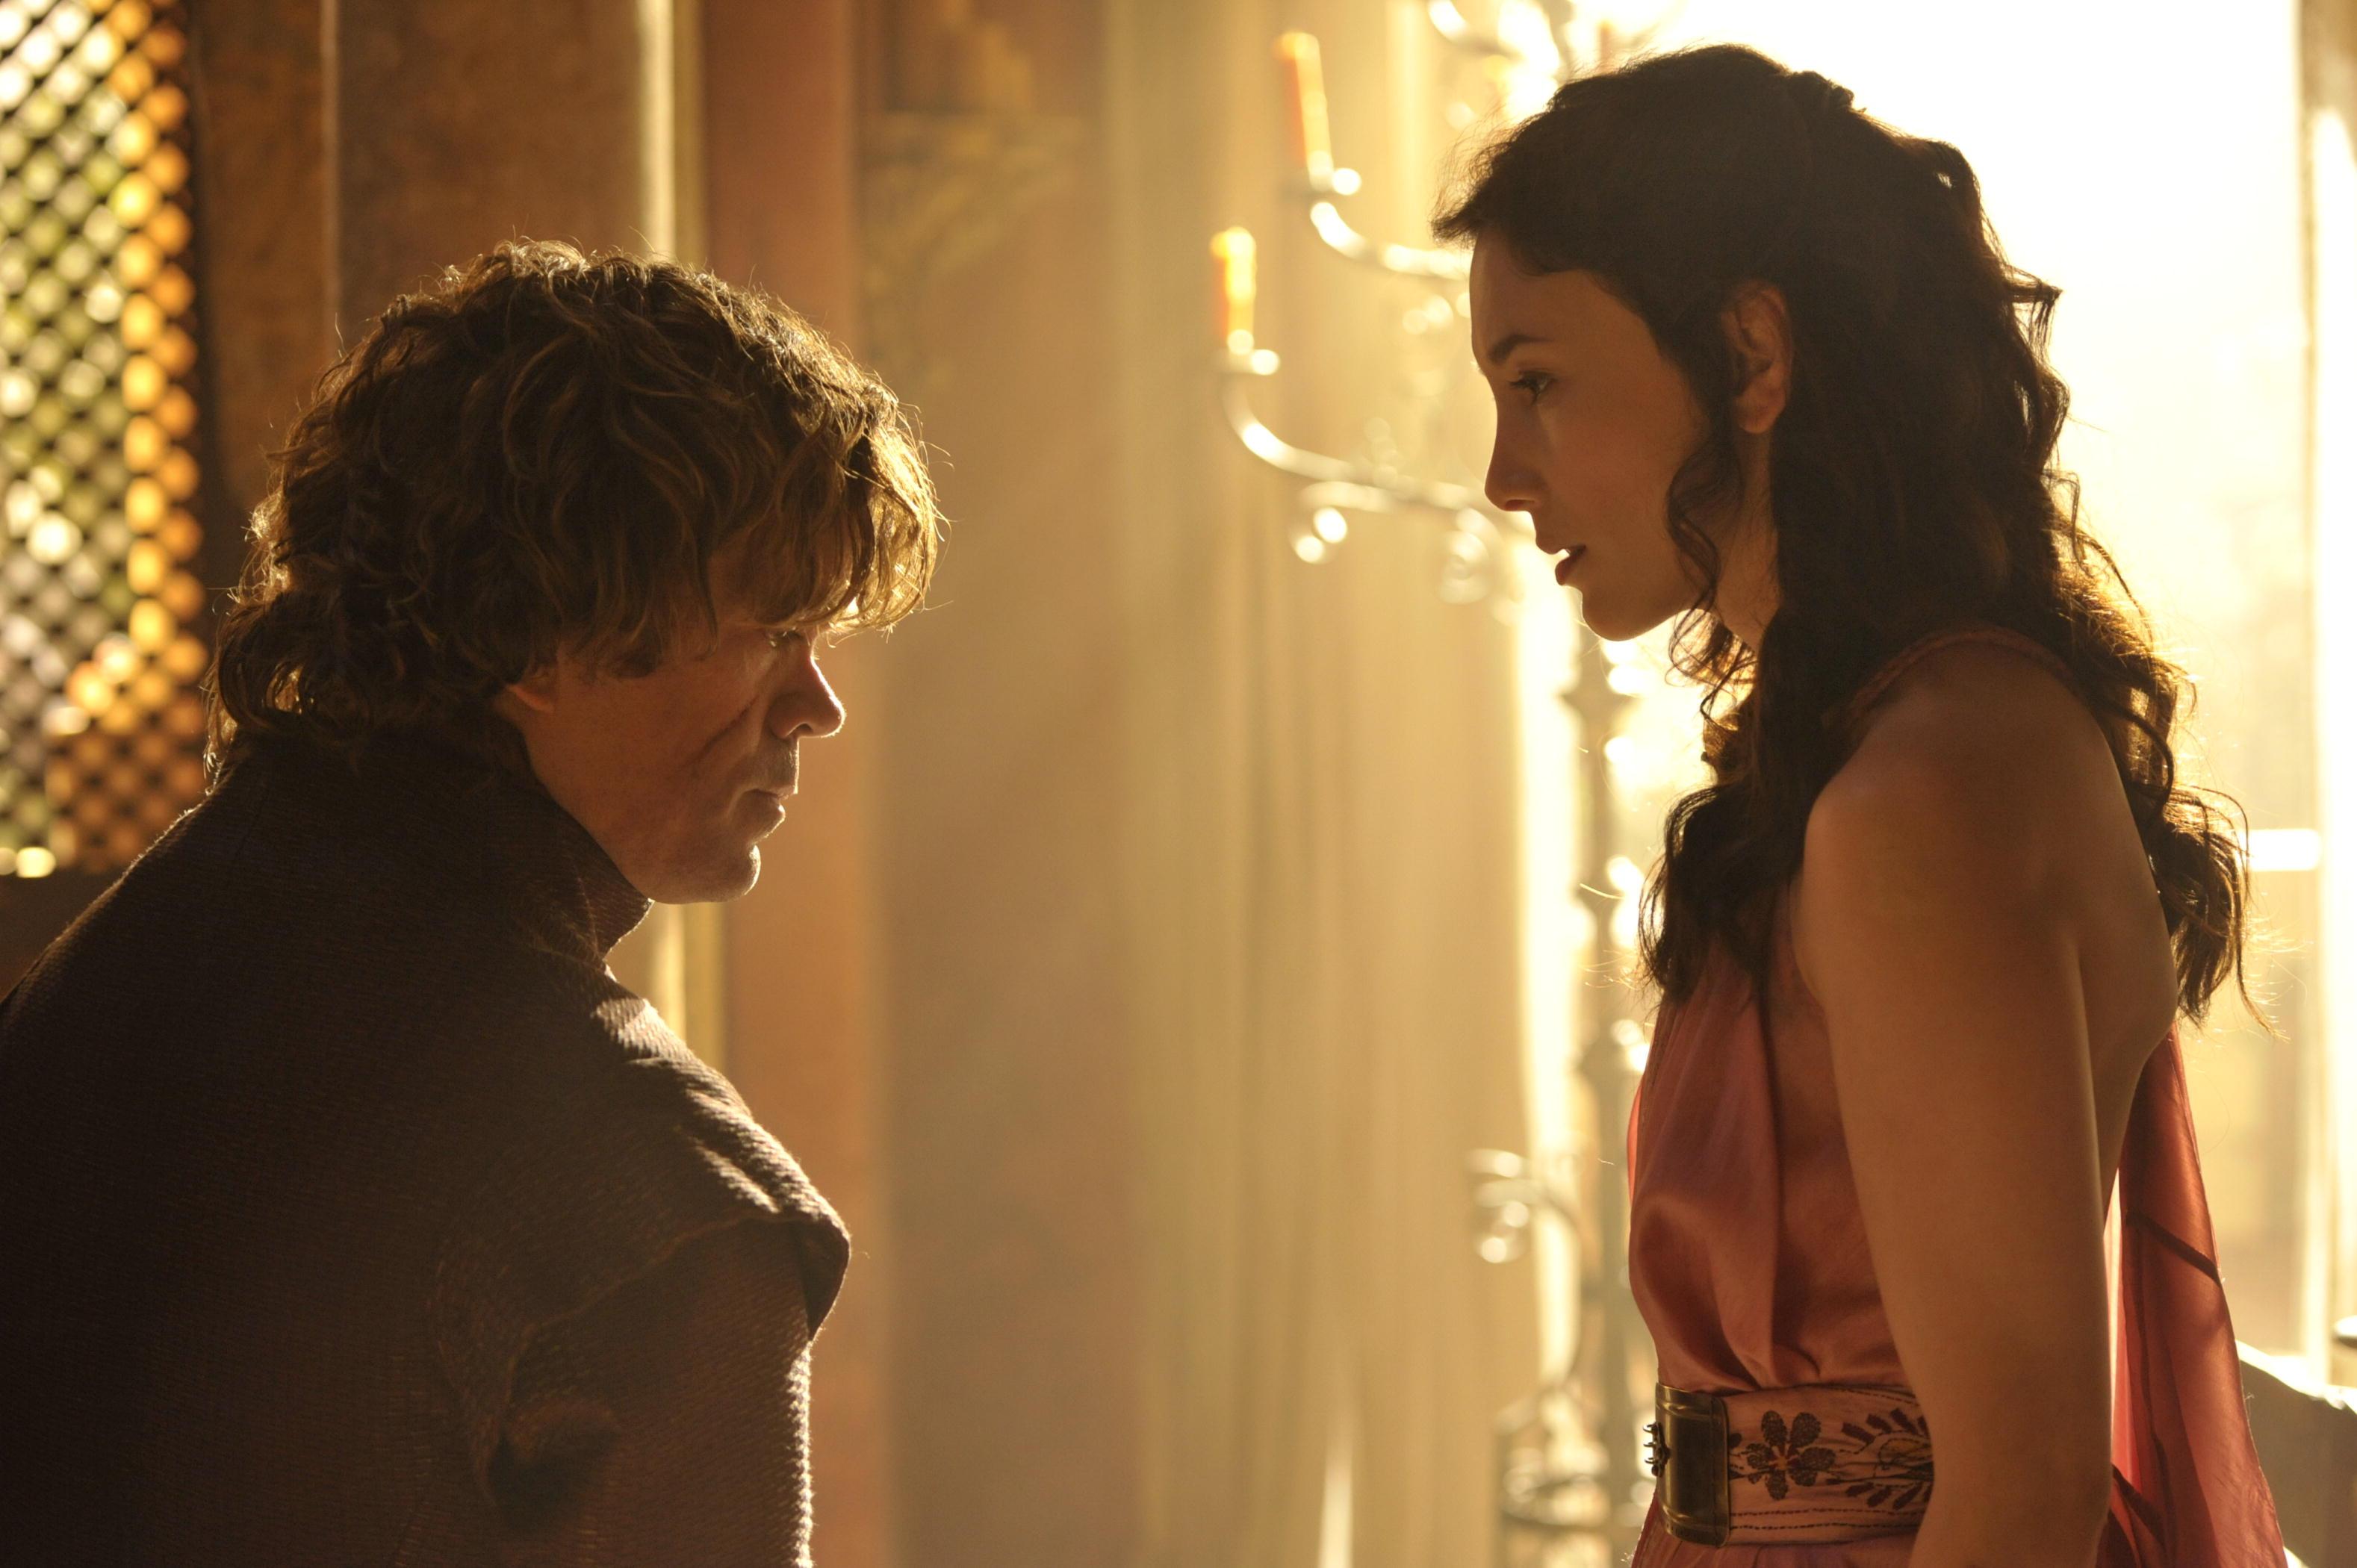 Game-of-Thrones-Season-4-Peter-Dinklage-Tyrion-Lannister-Sibel-Kekilli-Shae